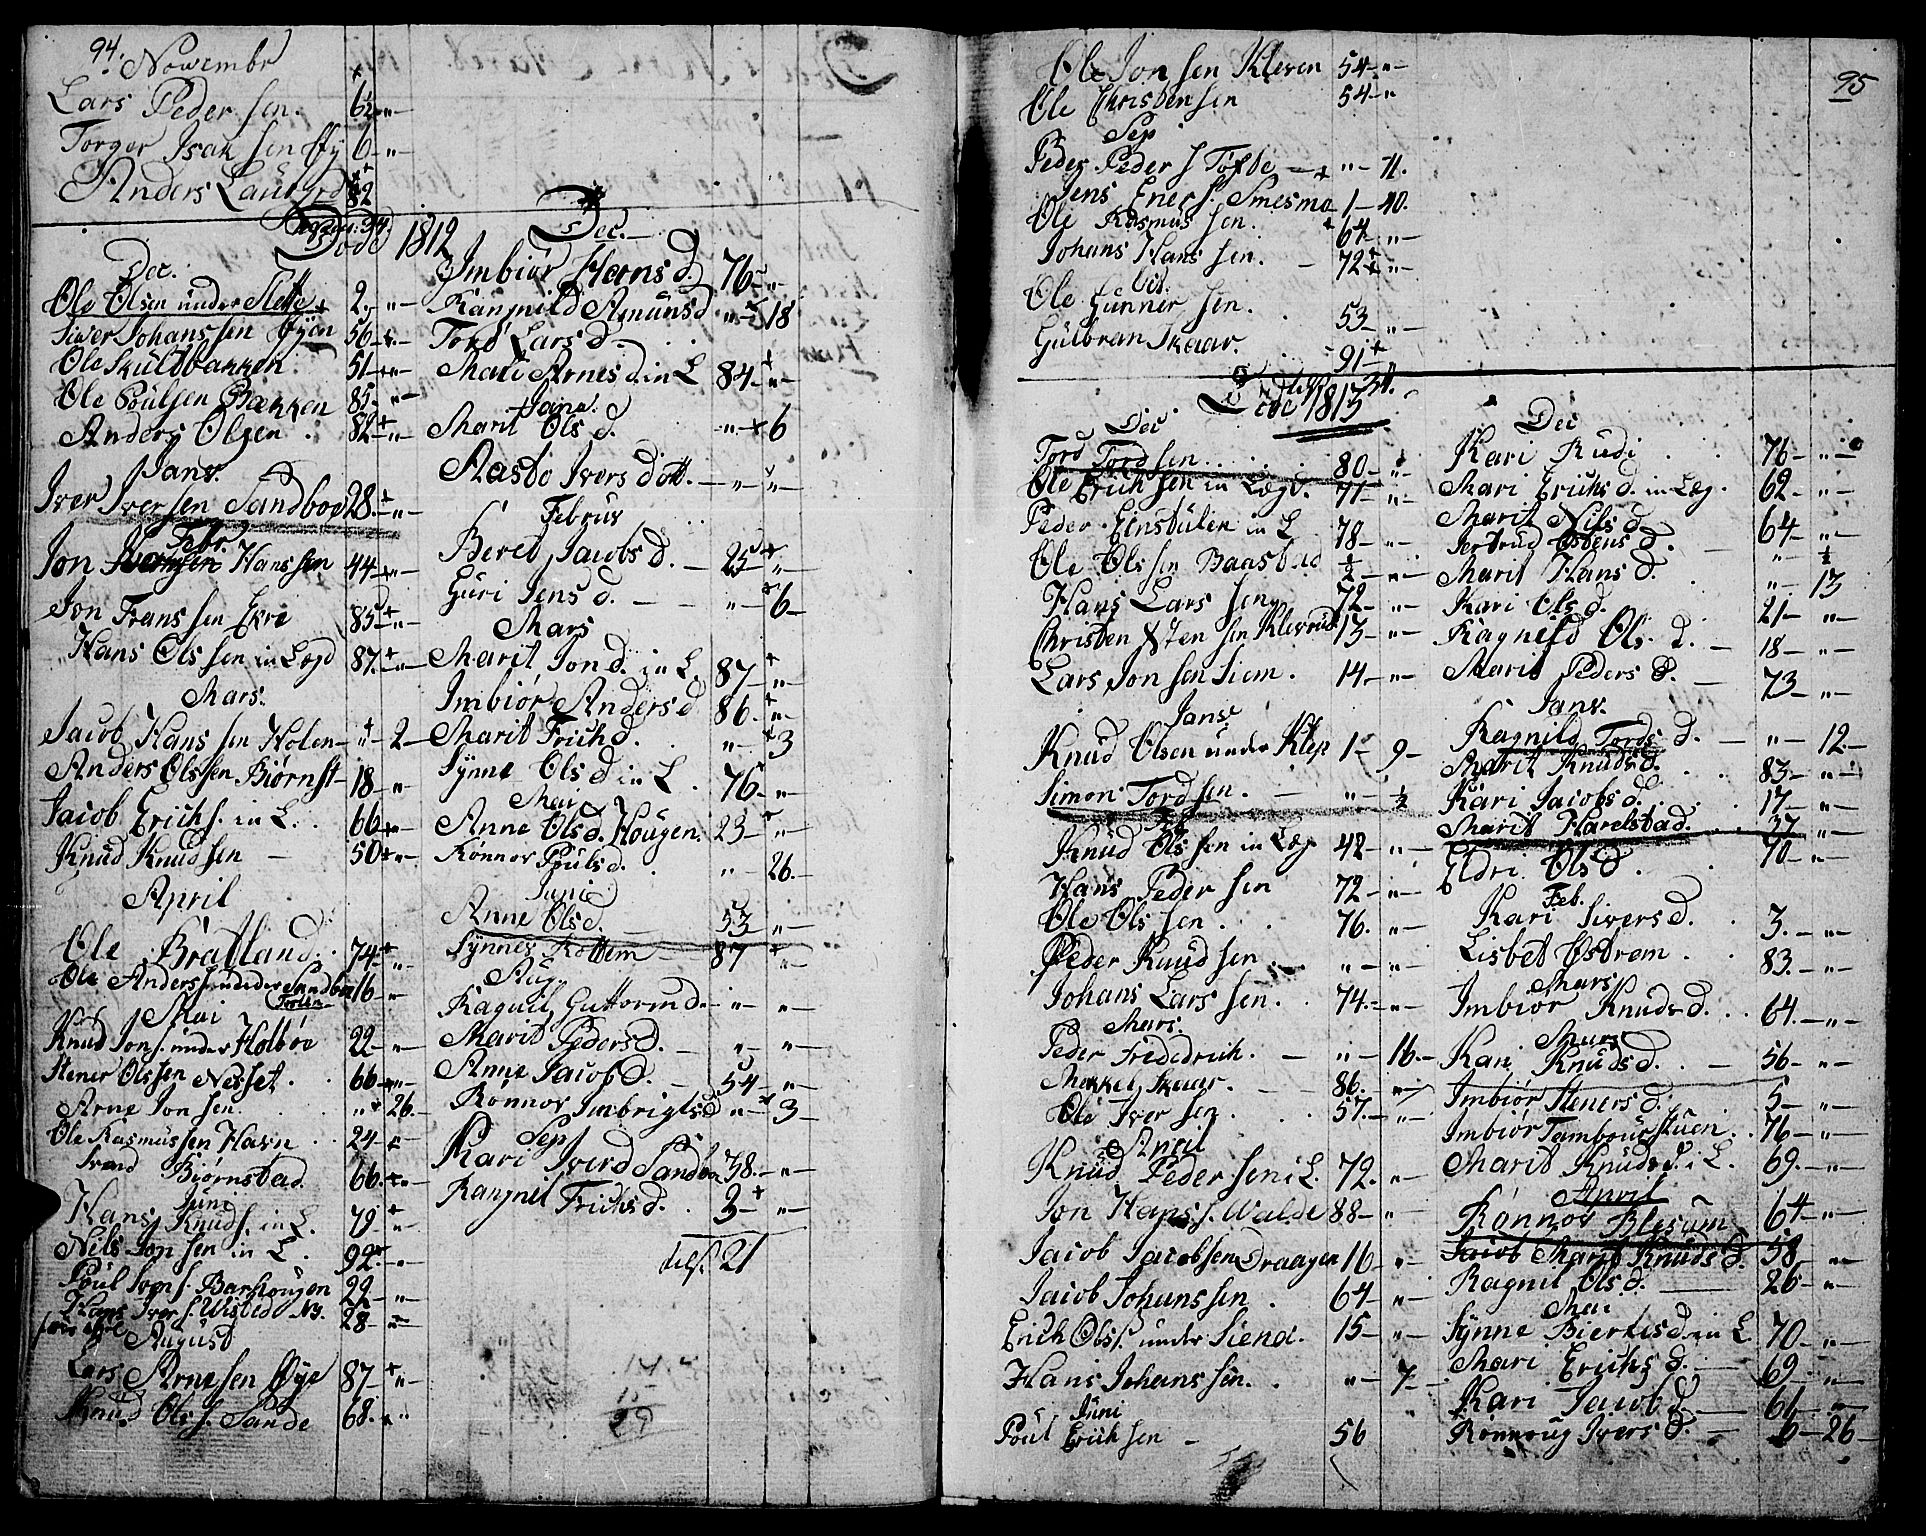 SAH, Vågå prestekontor, Ministerialbok nr. 2, 1810-1815, s. 94-95